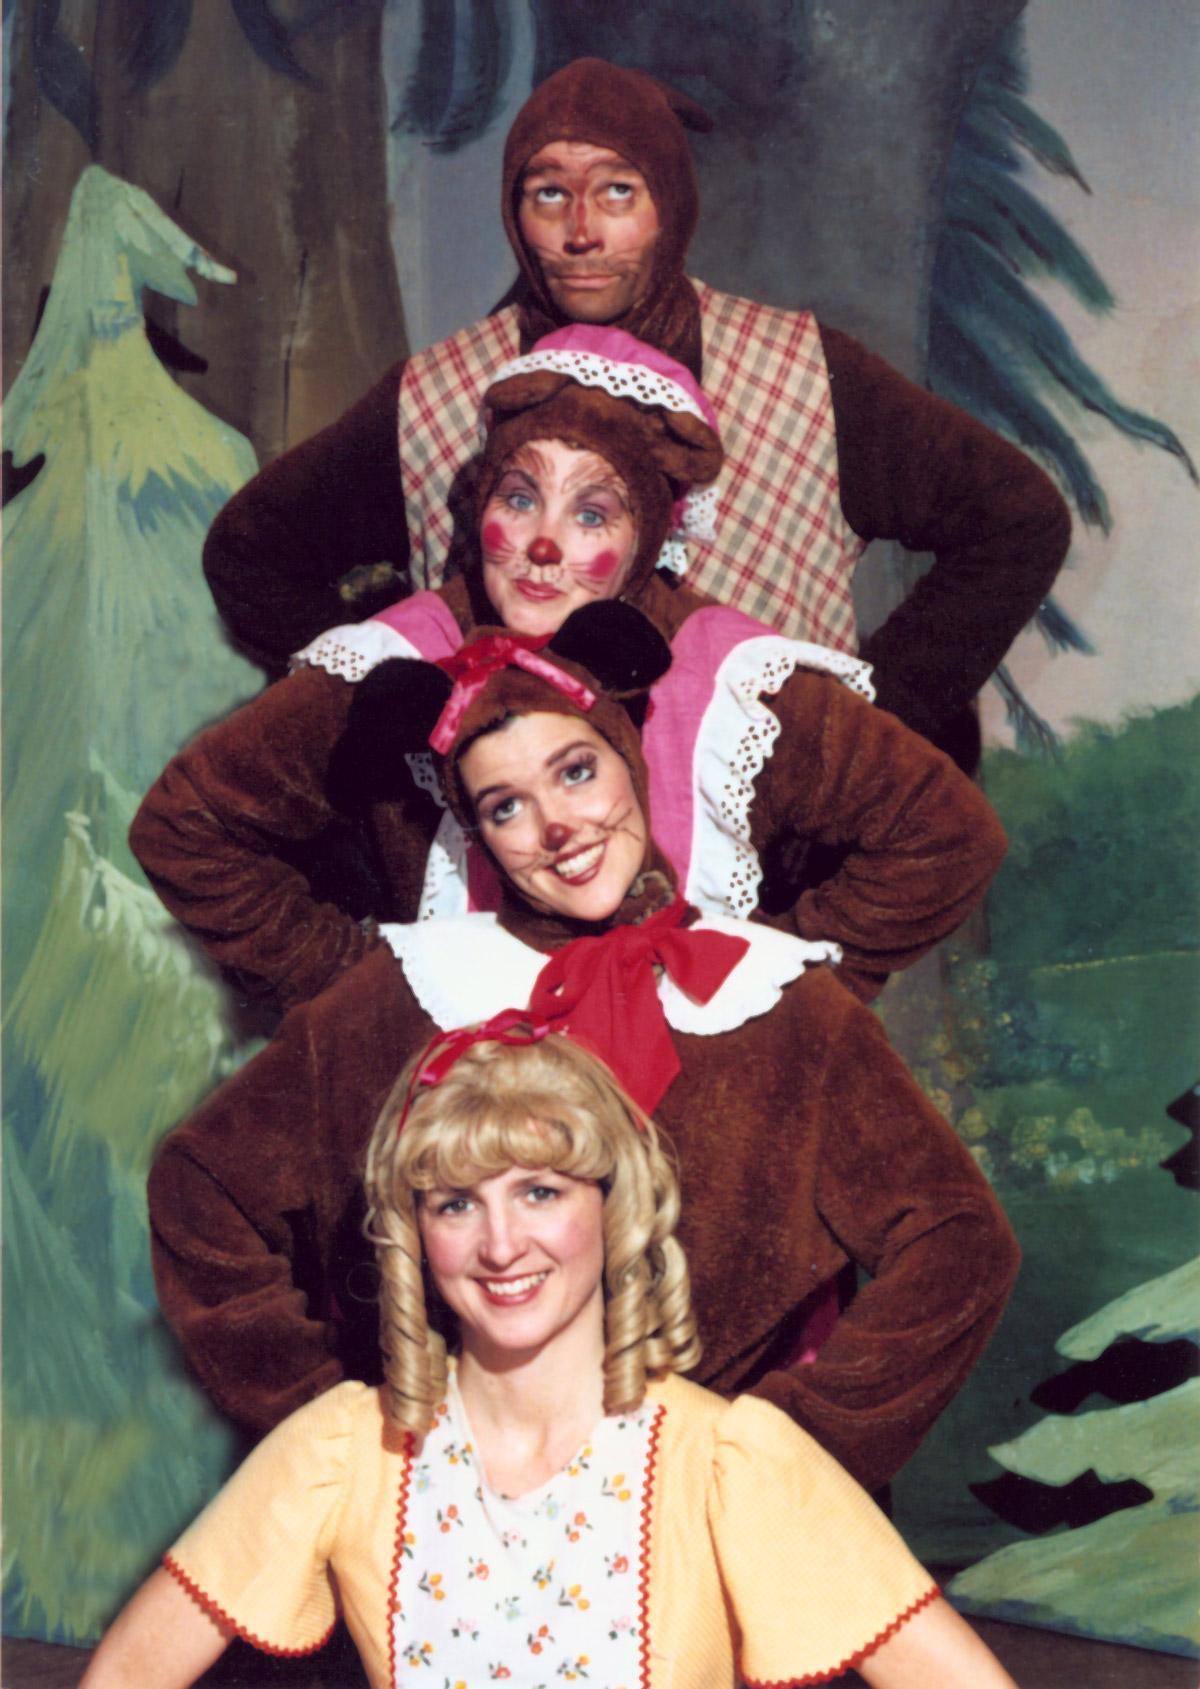 Hansel, Gretel, Goldilocks, and the Three Bears